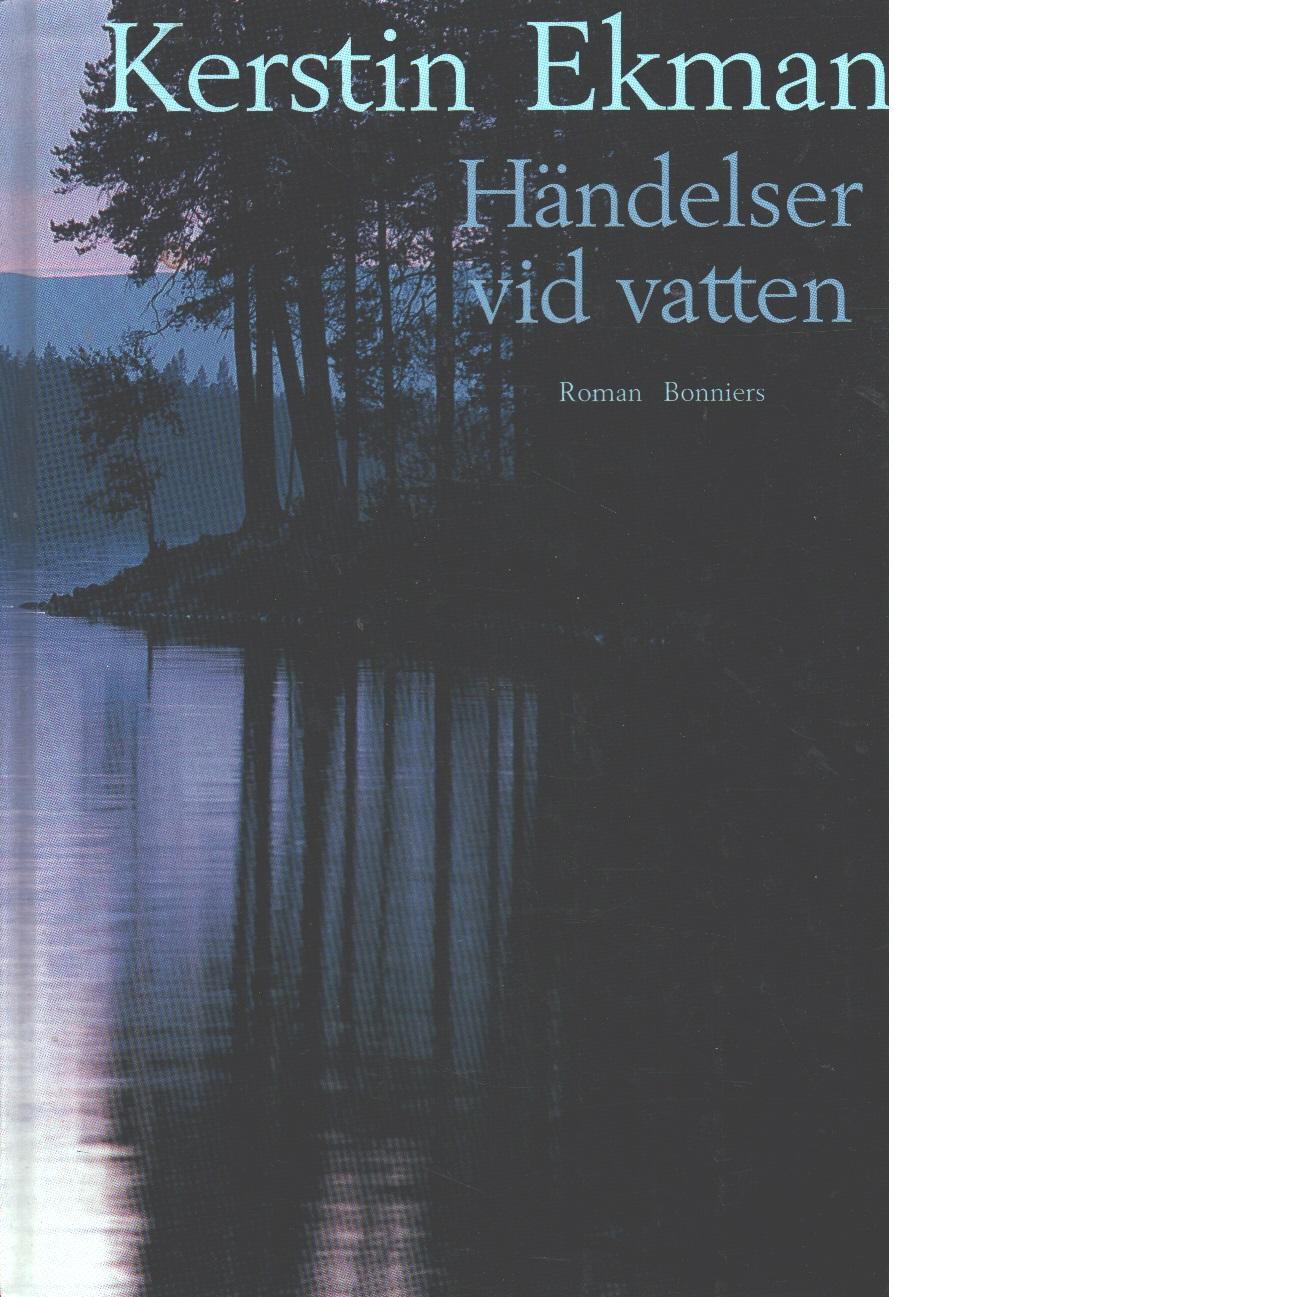 Händelser vid vatten - Ekman, Kerstin